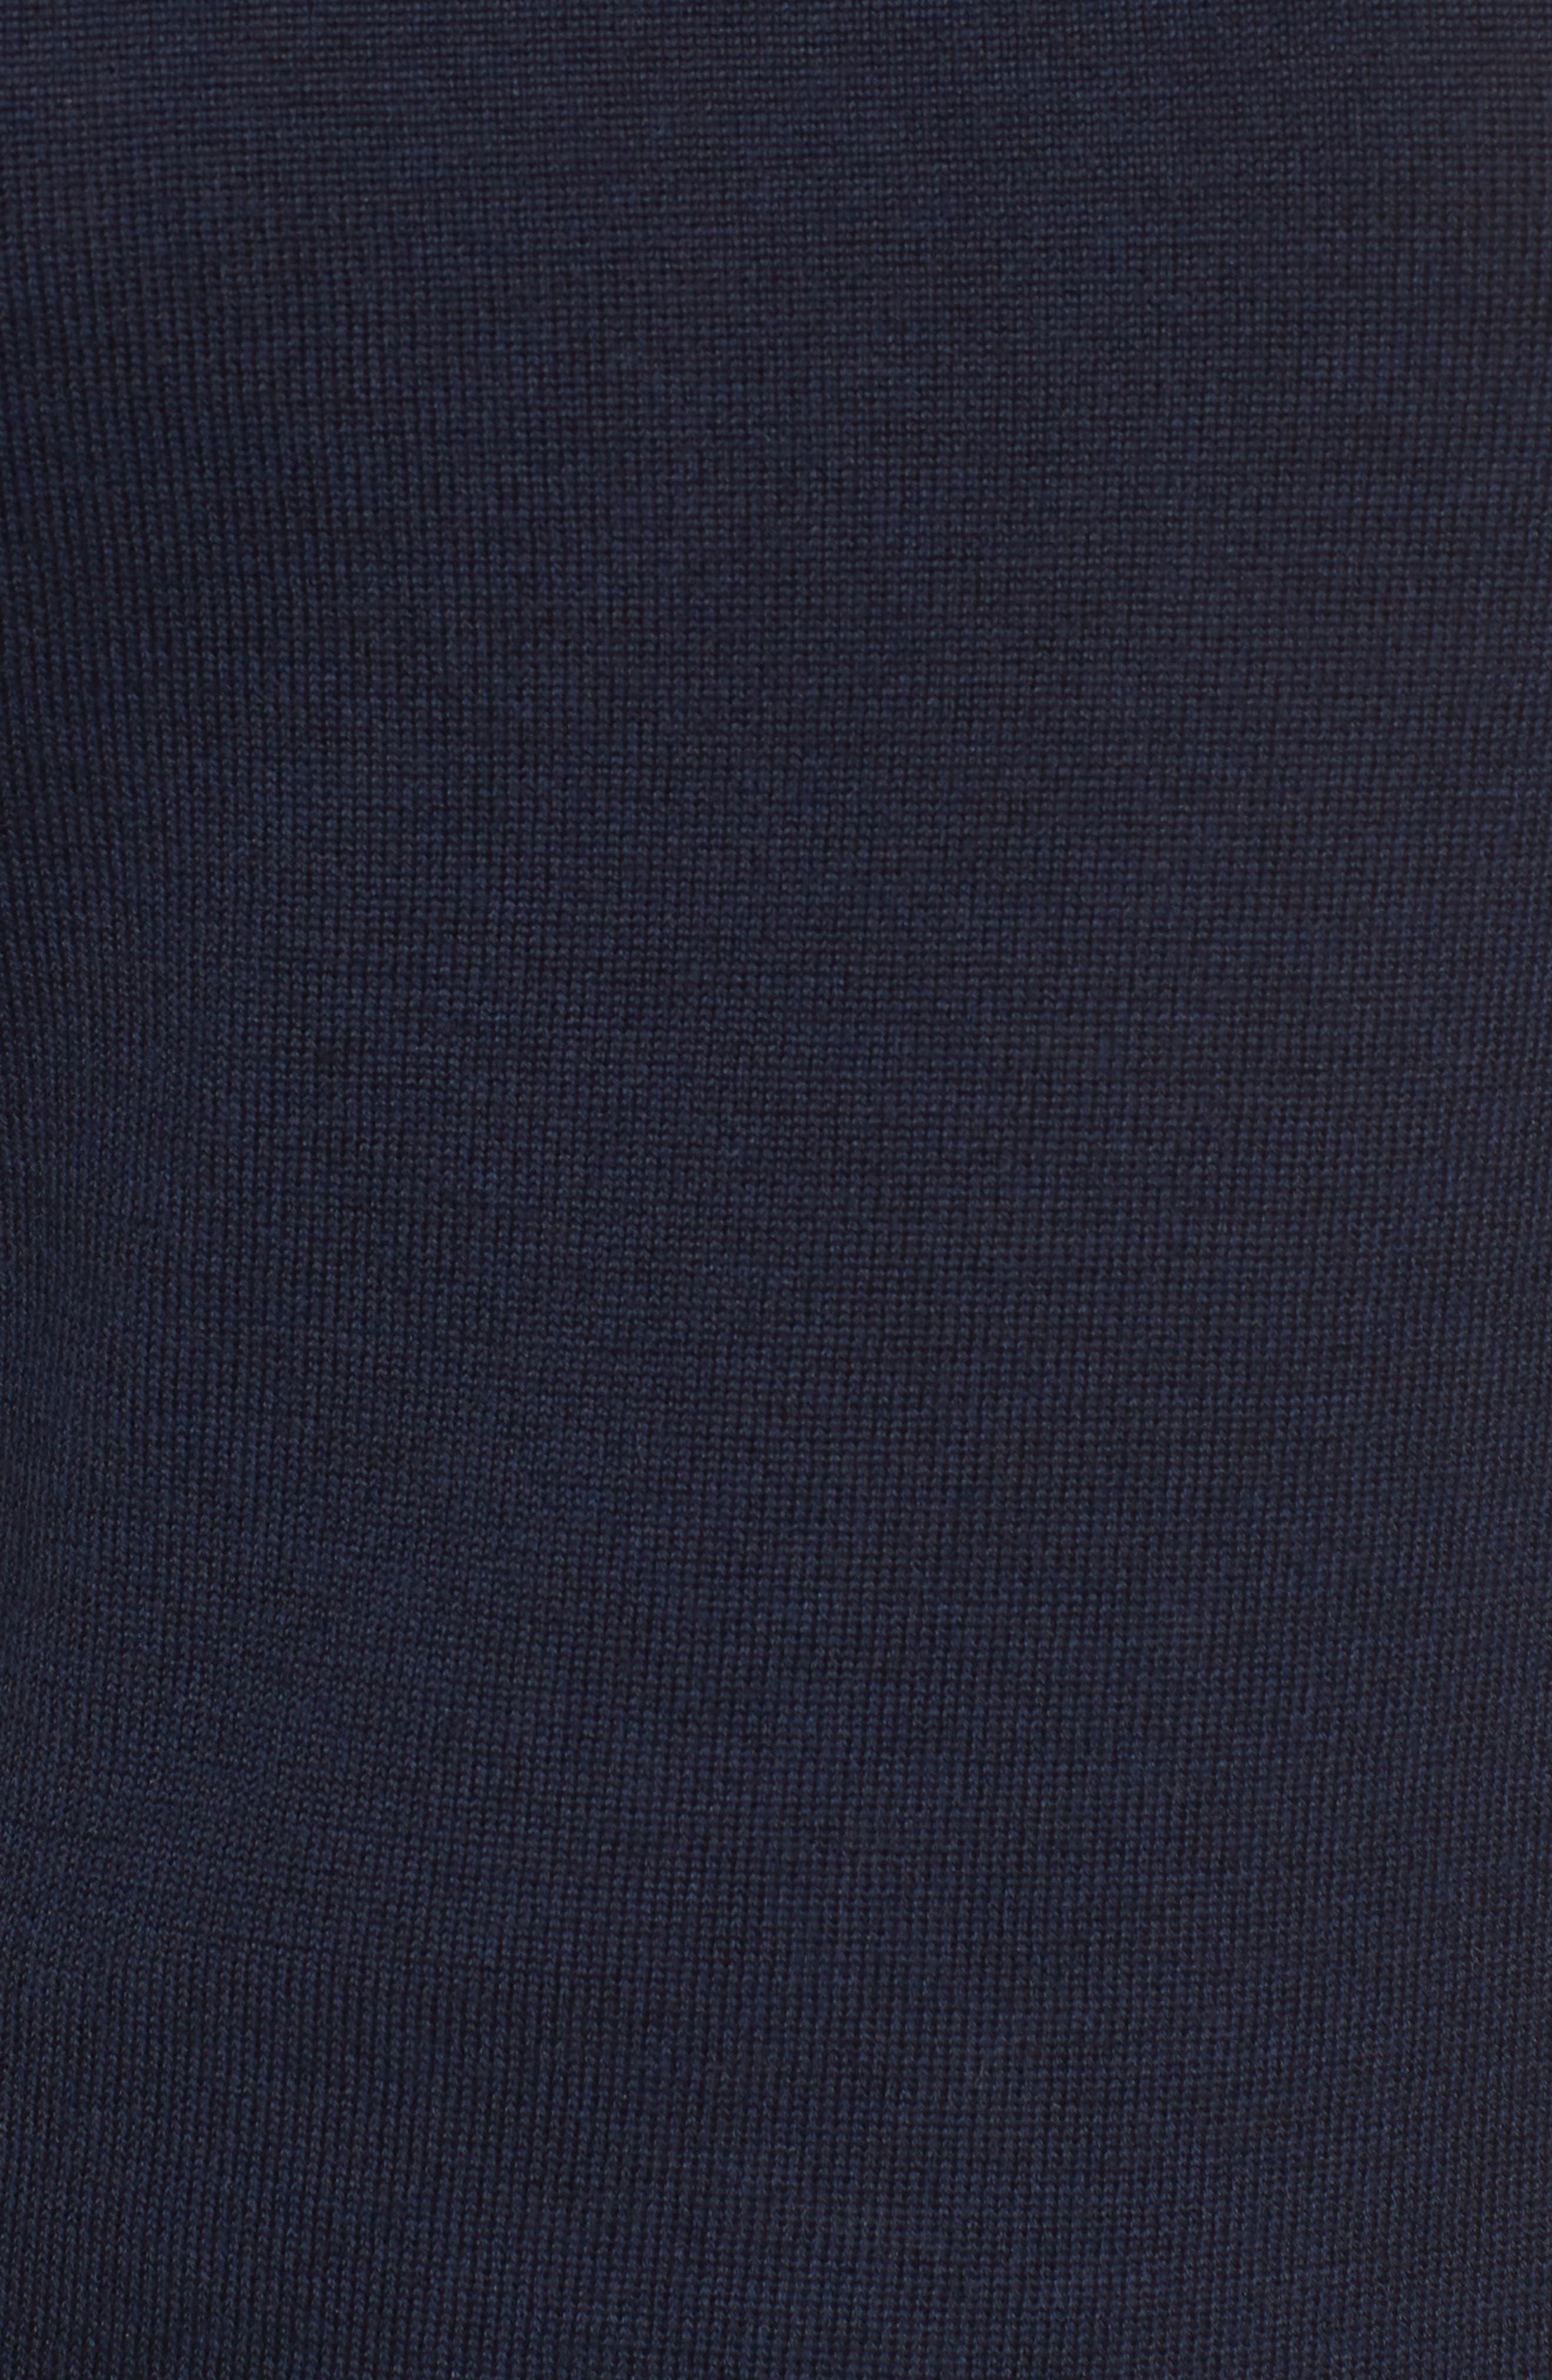 Tie Back Merino Wool & Silk Sweater,                             Alternate thumbnail 9, color,